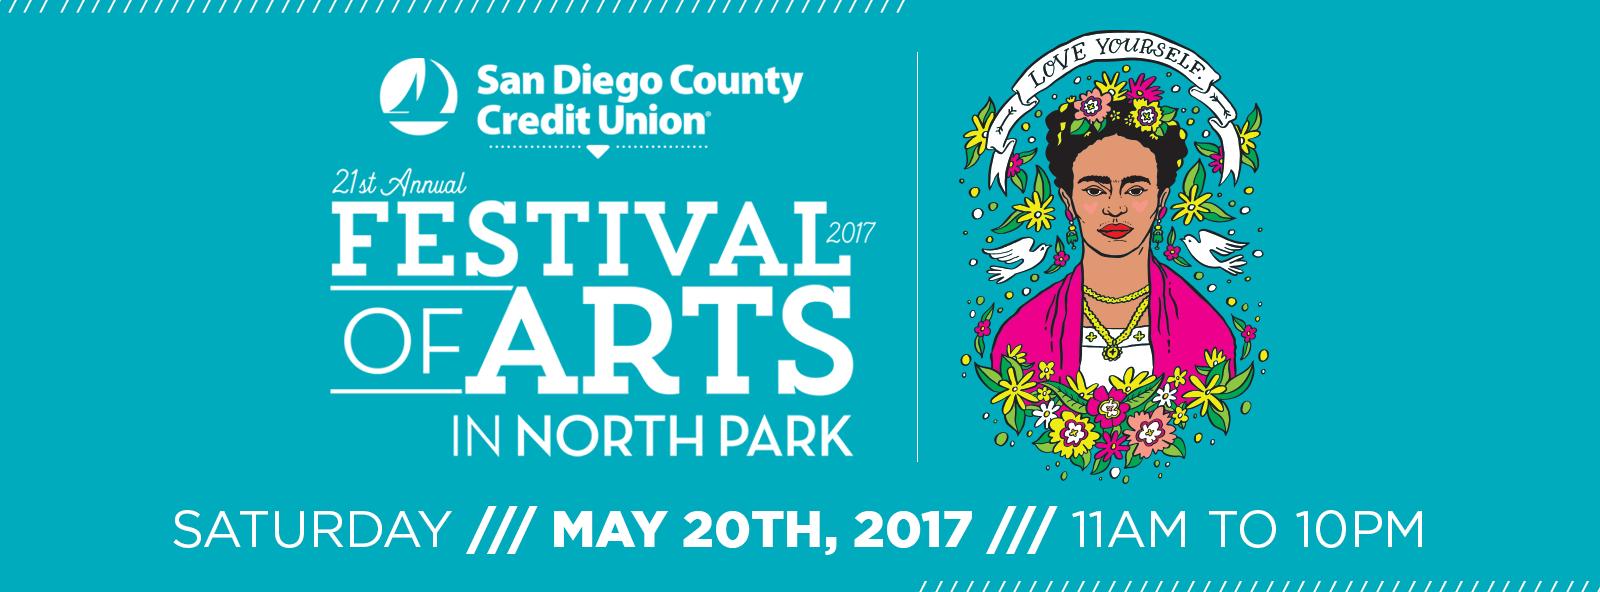 North Park Festival of Arts 2017